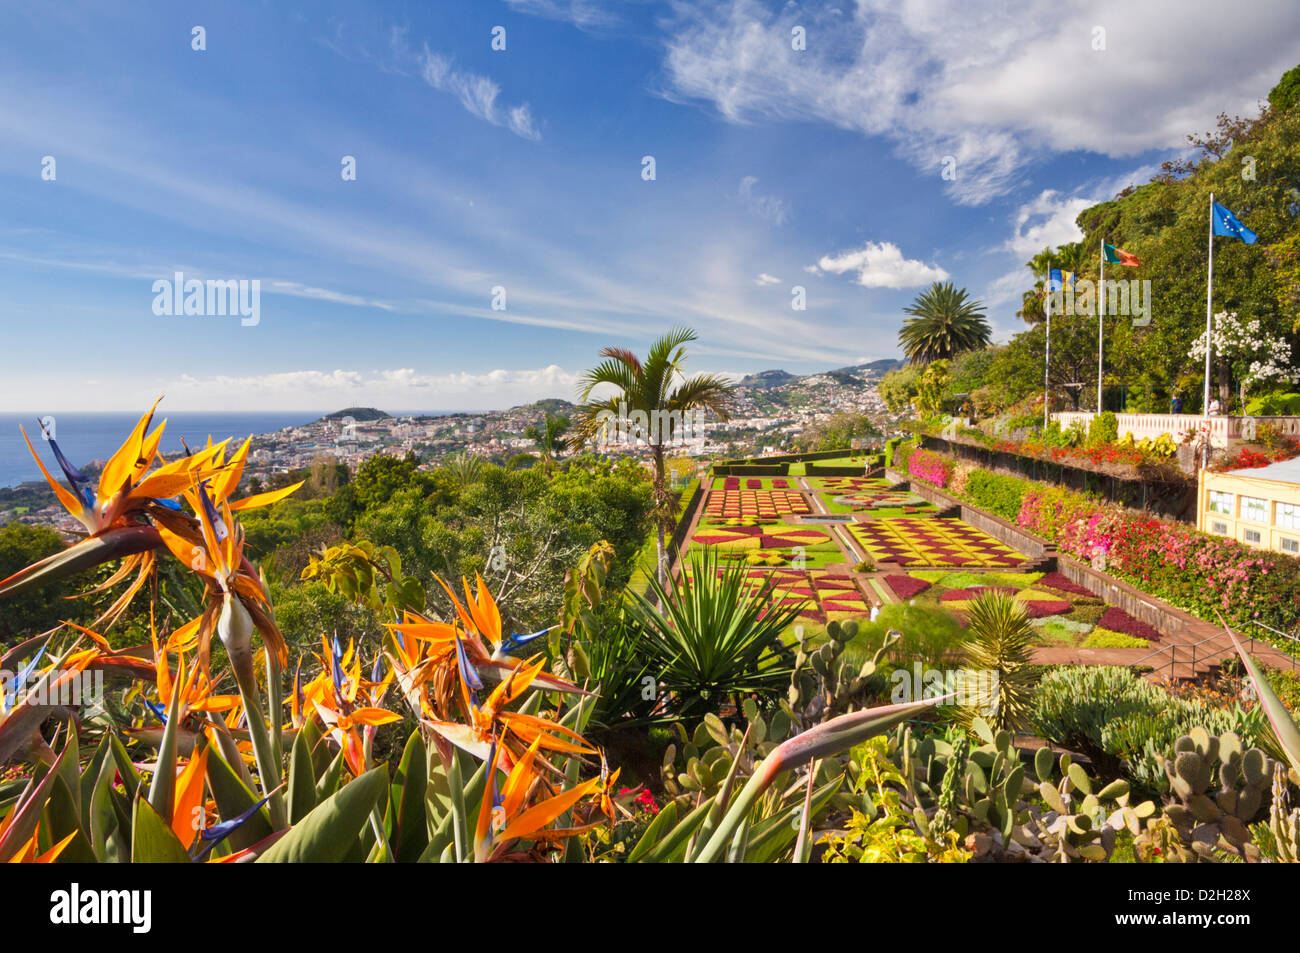 Jardin formel s'affichent dans le Jardin Botanique Jardim Botanico Funchal Madeira Portugal Europe de l'UE Photo Stock